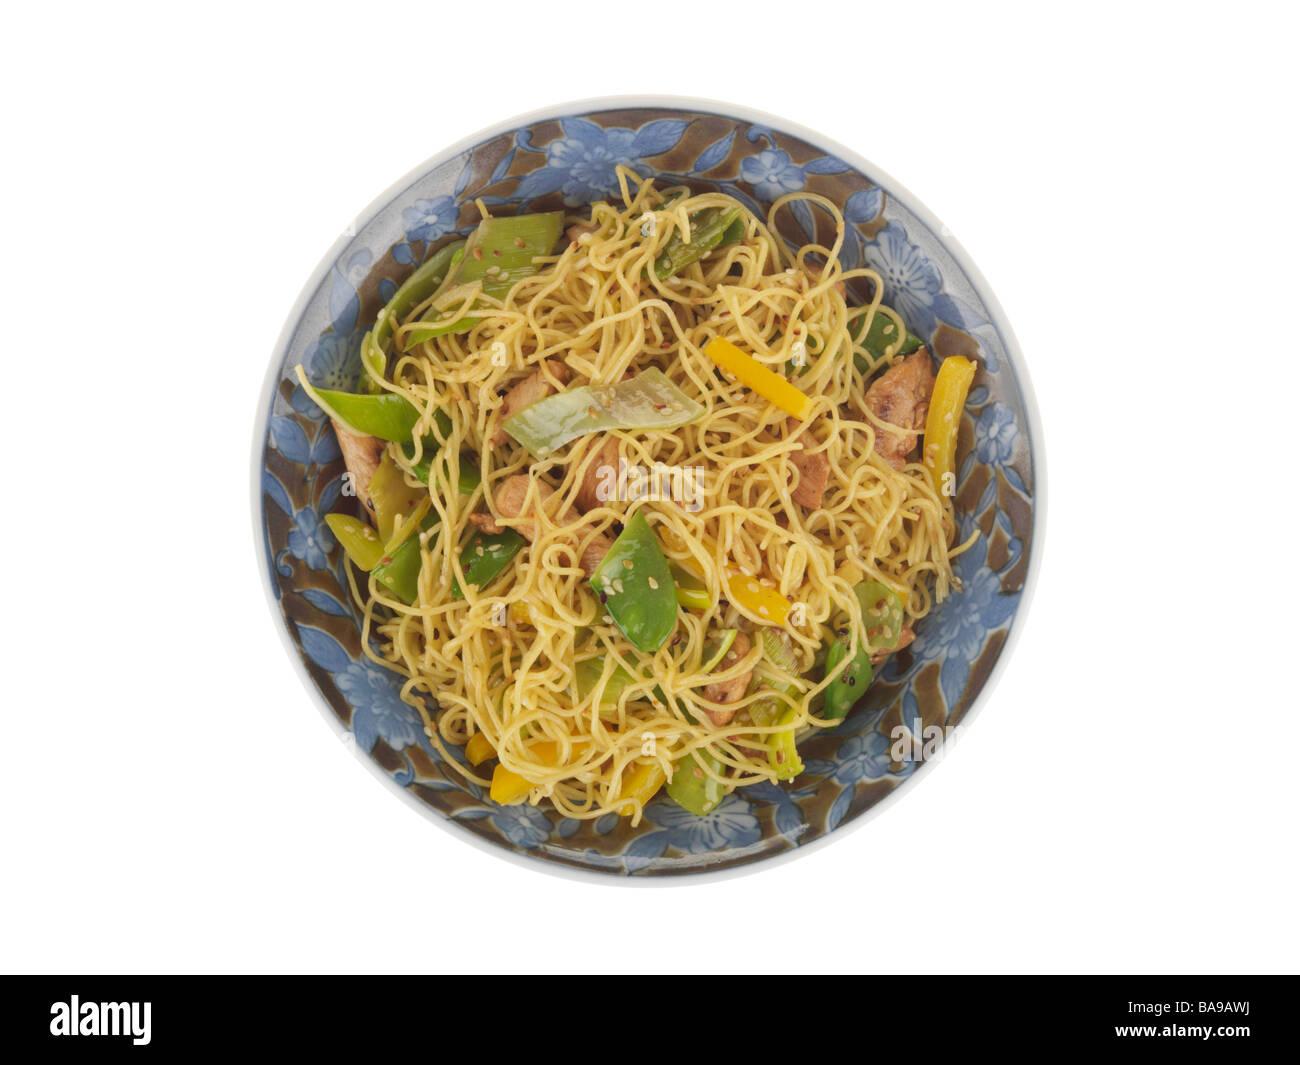 Bowl of Stir Fry - Stock Image